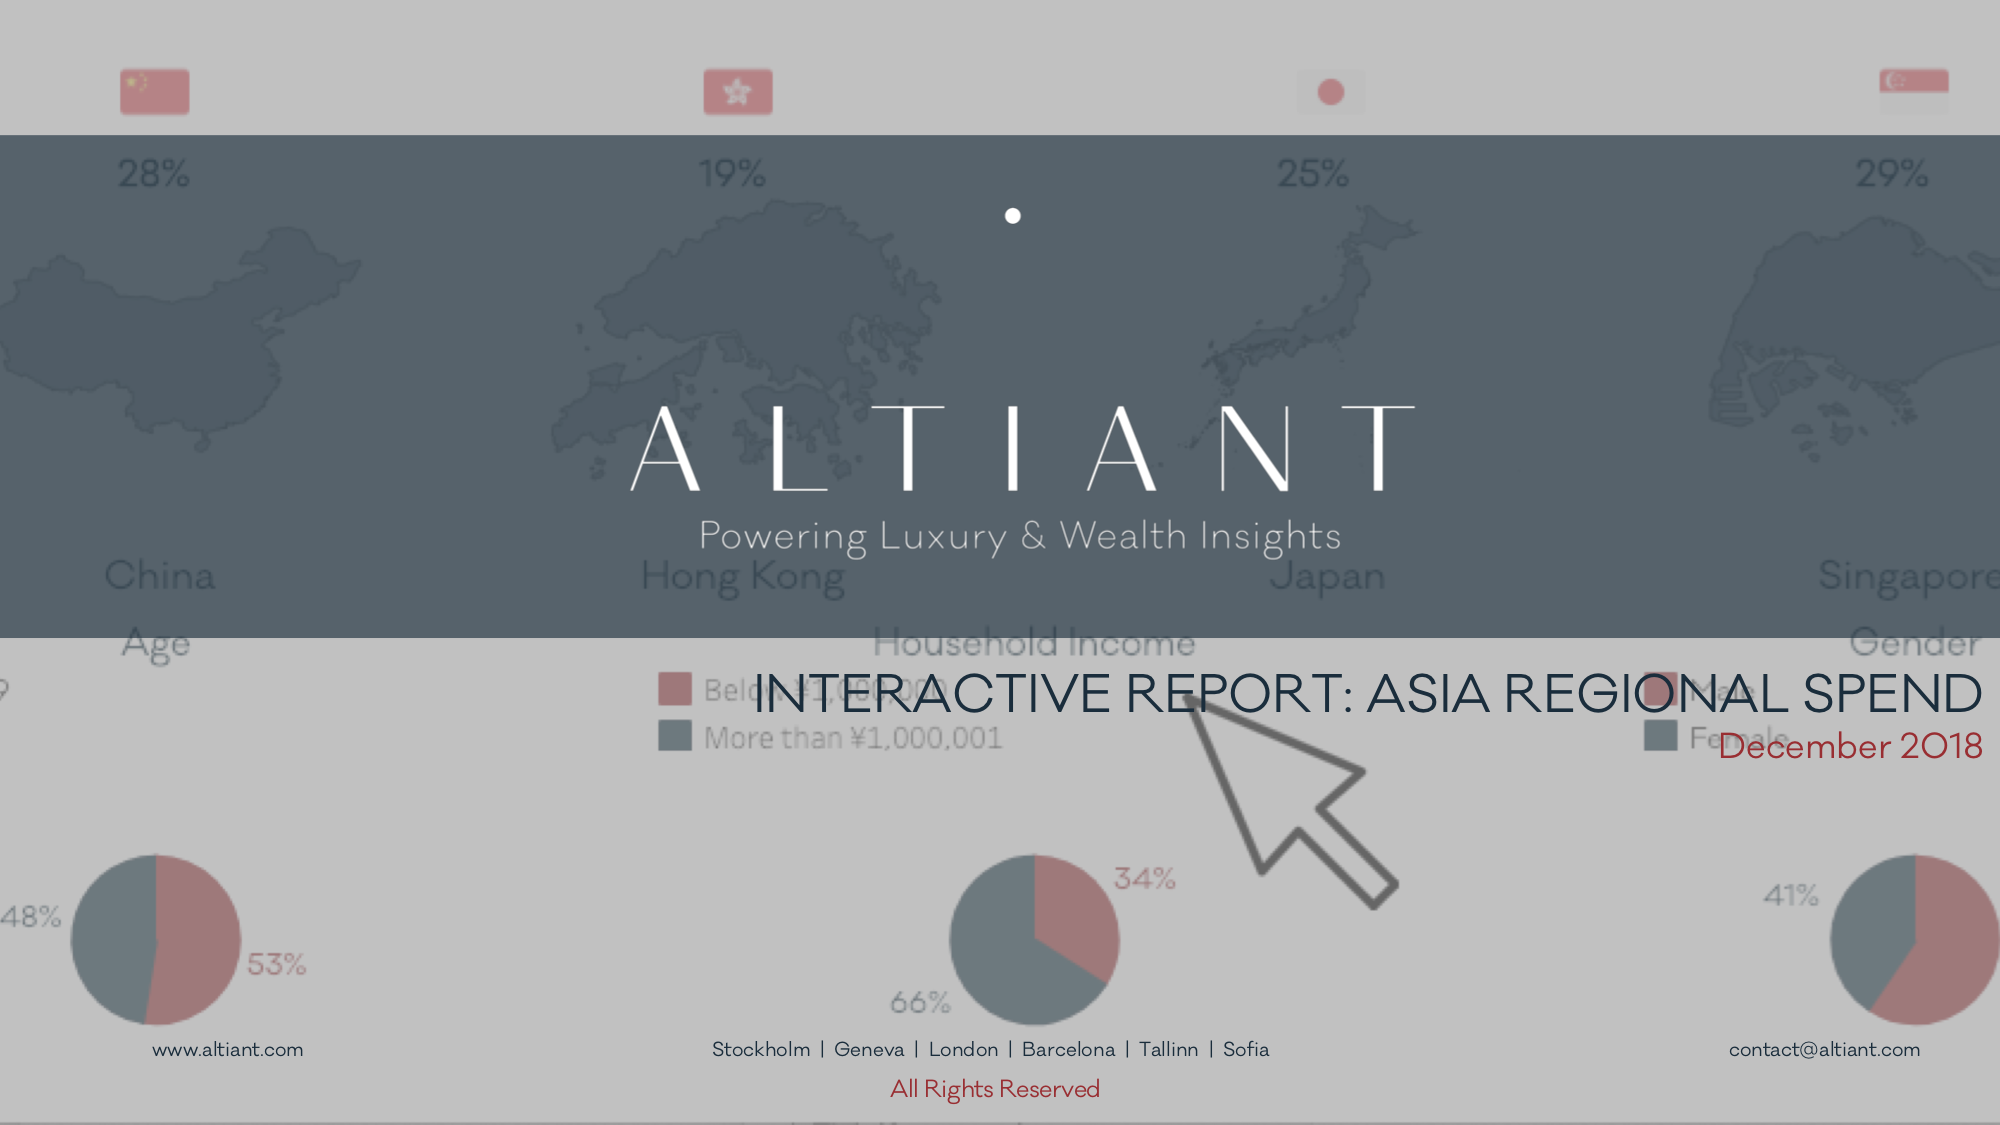 INTERACTIVE REPORT copy.png